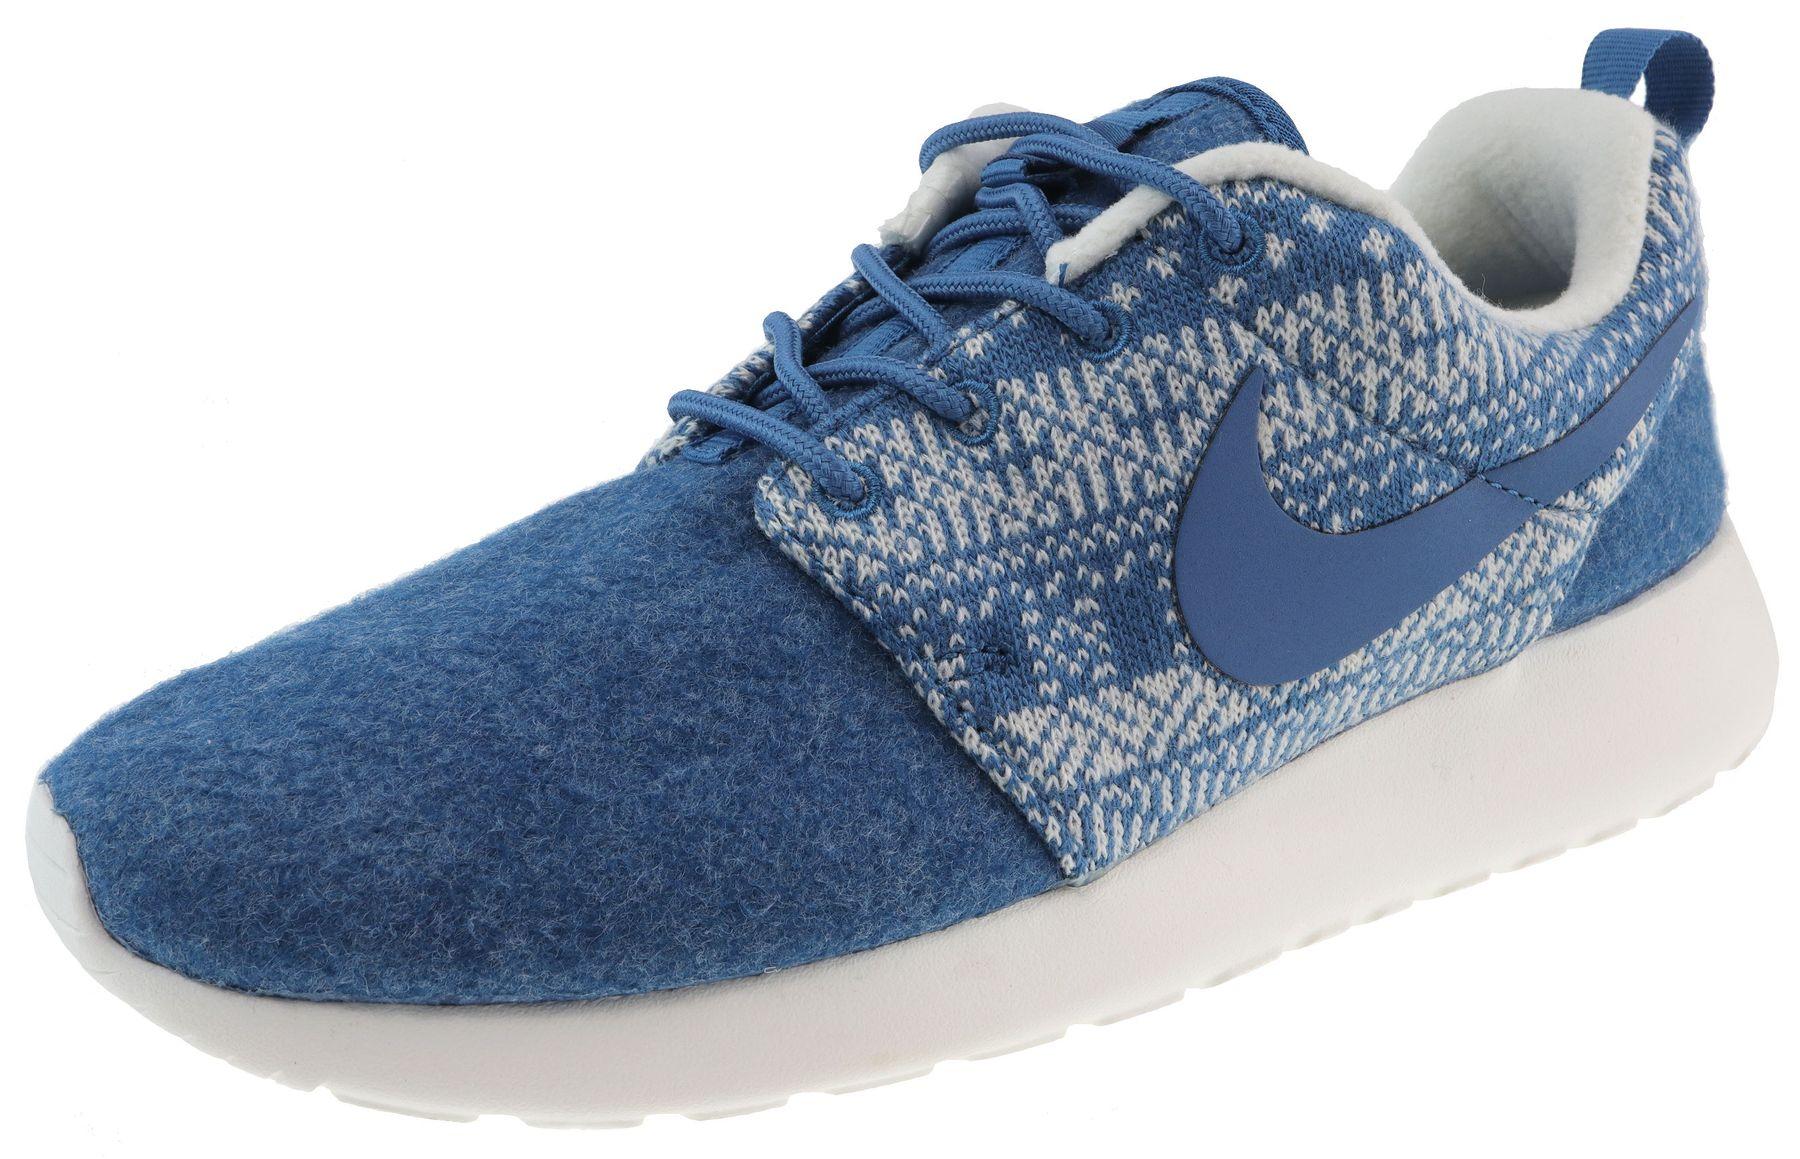 Nike Casual Roshe One Winter Brigade Blue Brigade Blue Gr.38.0